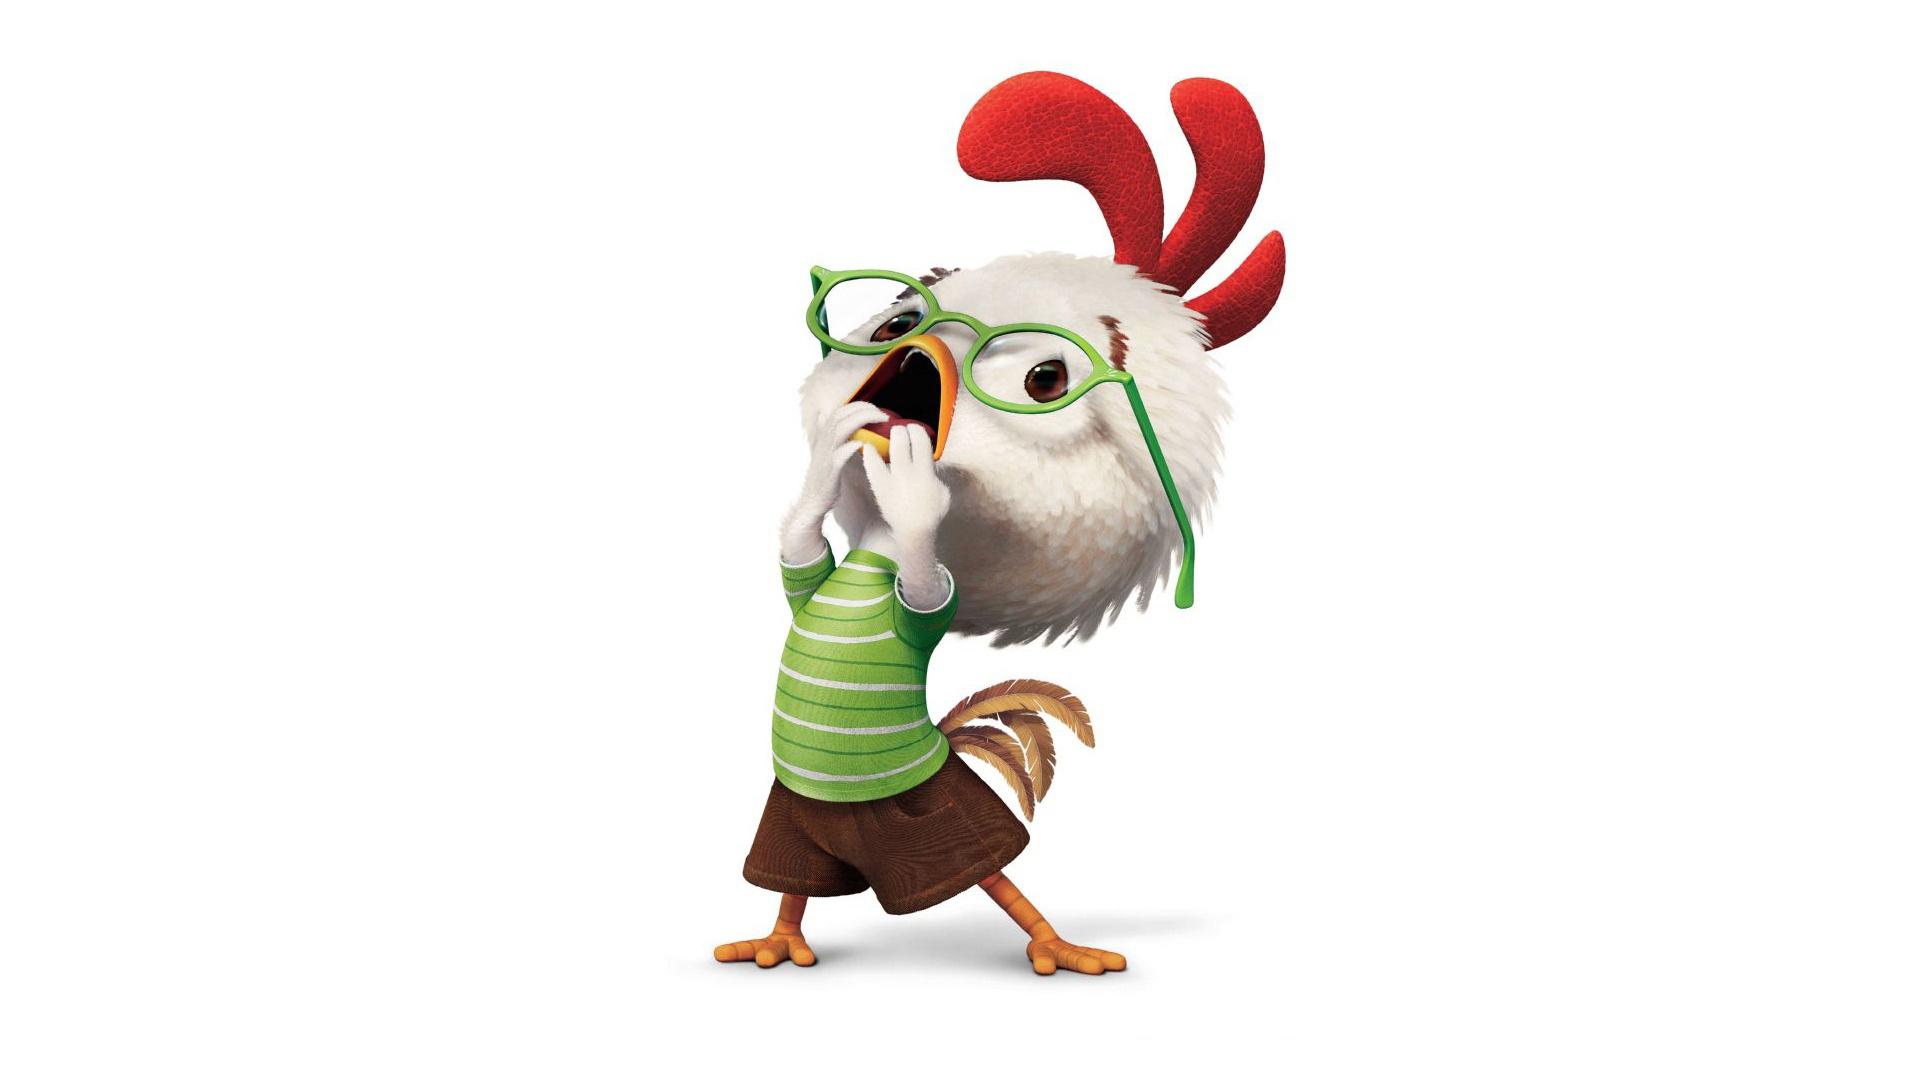 chicken-little-518ebe72e4ca3.jpg